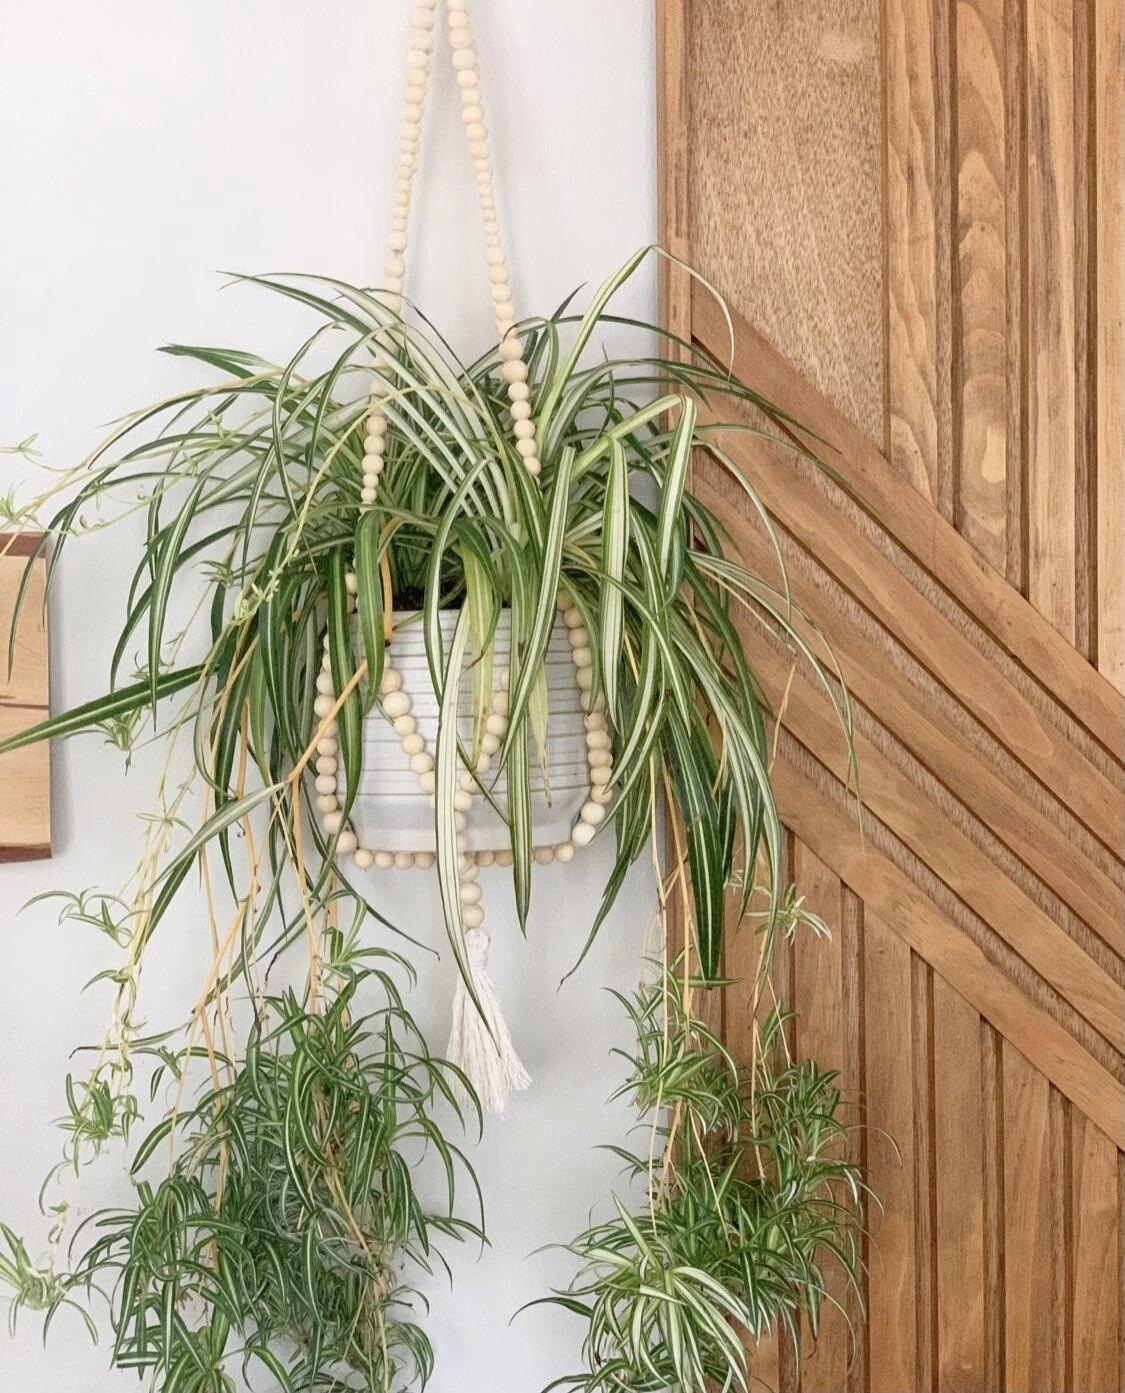 Wooden Bead Plant Hanger Workshop with Sara Buckley